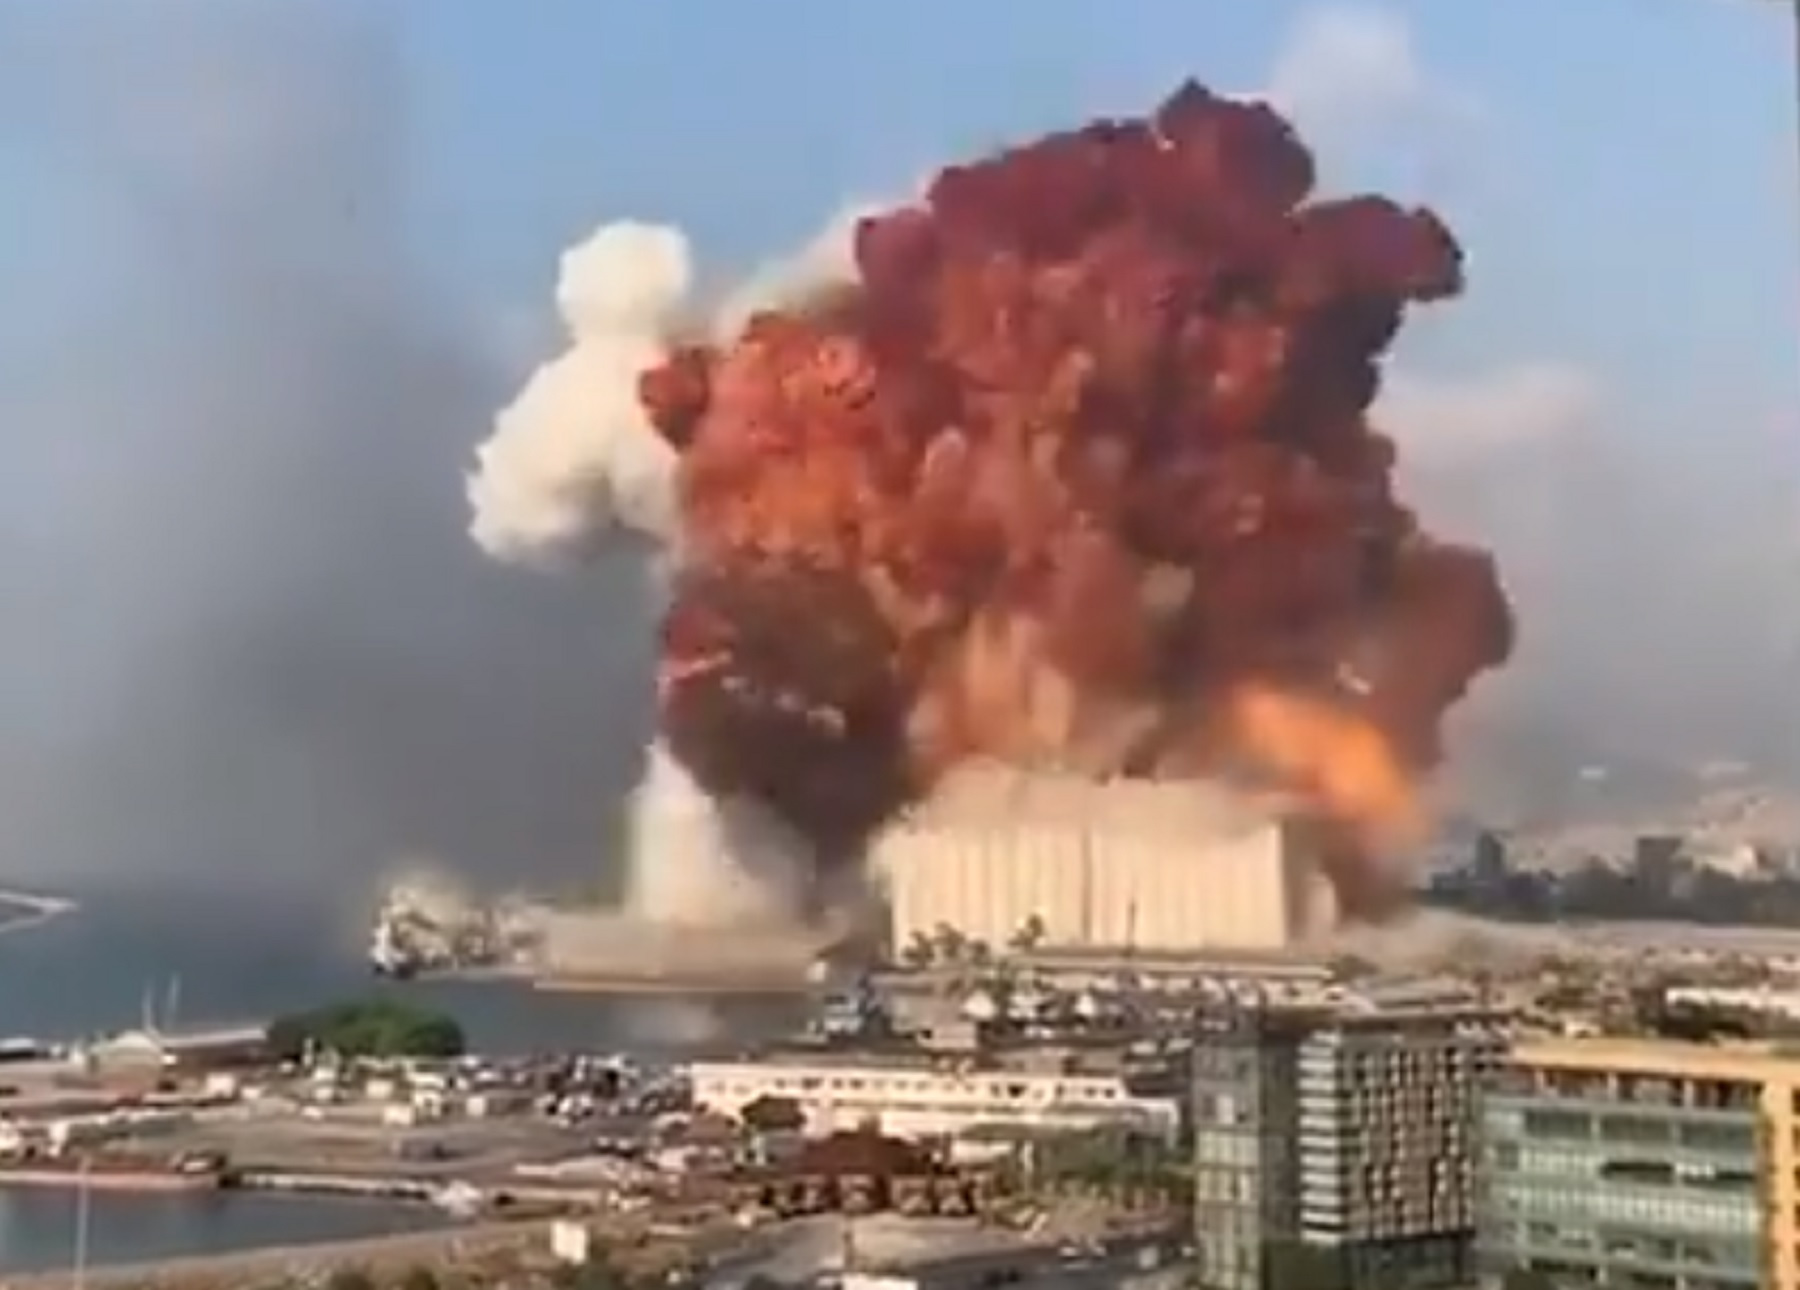 Spaventosa esplosione a Beirut. Decine di morti, migliaia i feriti ...